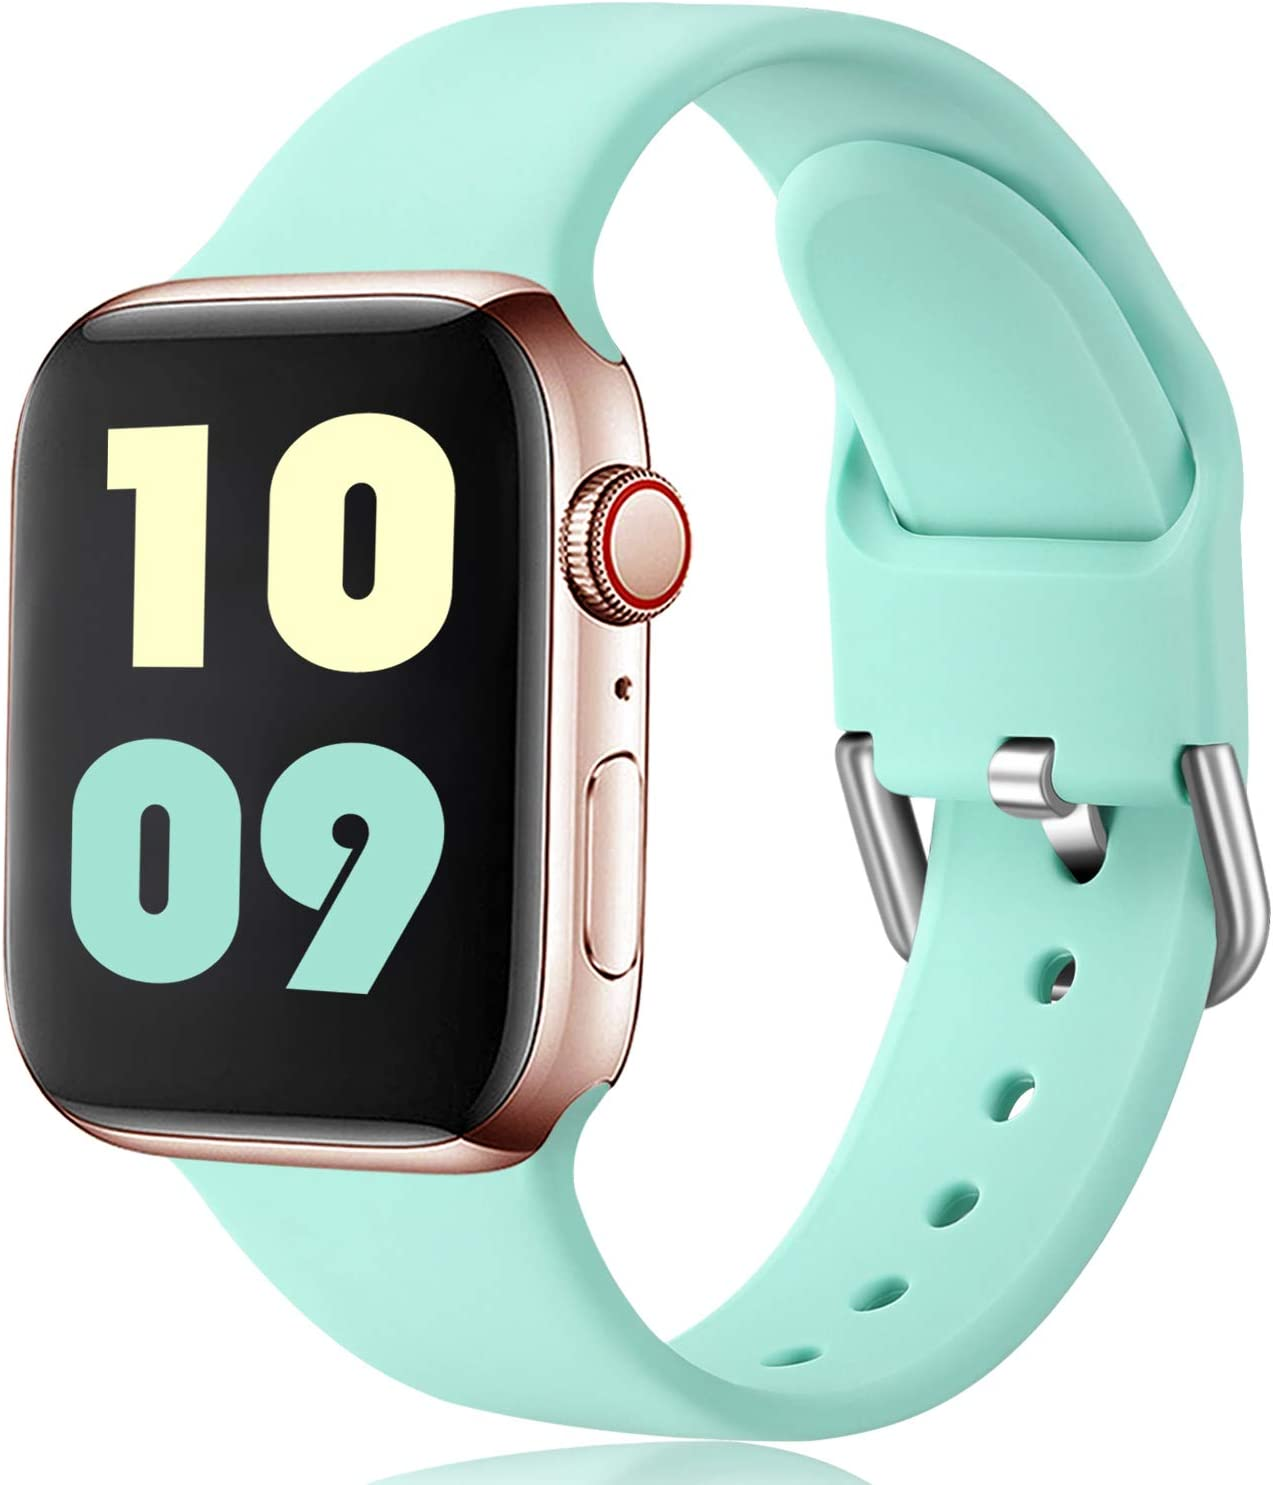 Ouwegaga Compatible con Apple Watch Correa 38mm 42mm 40mm 44mm, Correa de Reemplazo Deportiva de Silicona Suave Compatible con Apple Watch SE/iWatch Series 6/5/4/3/2/1, 38mm/40mm S/M Nuevo Turquesa